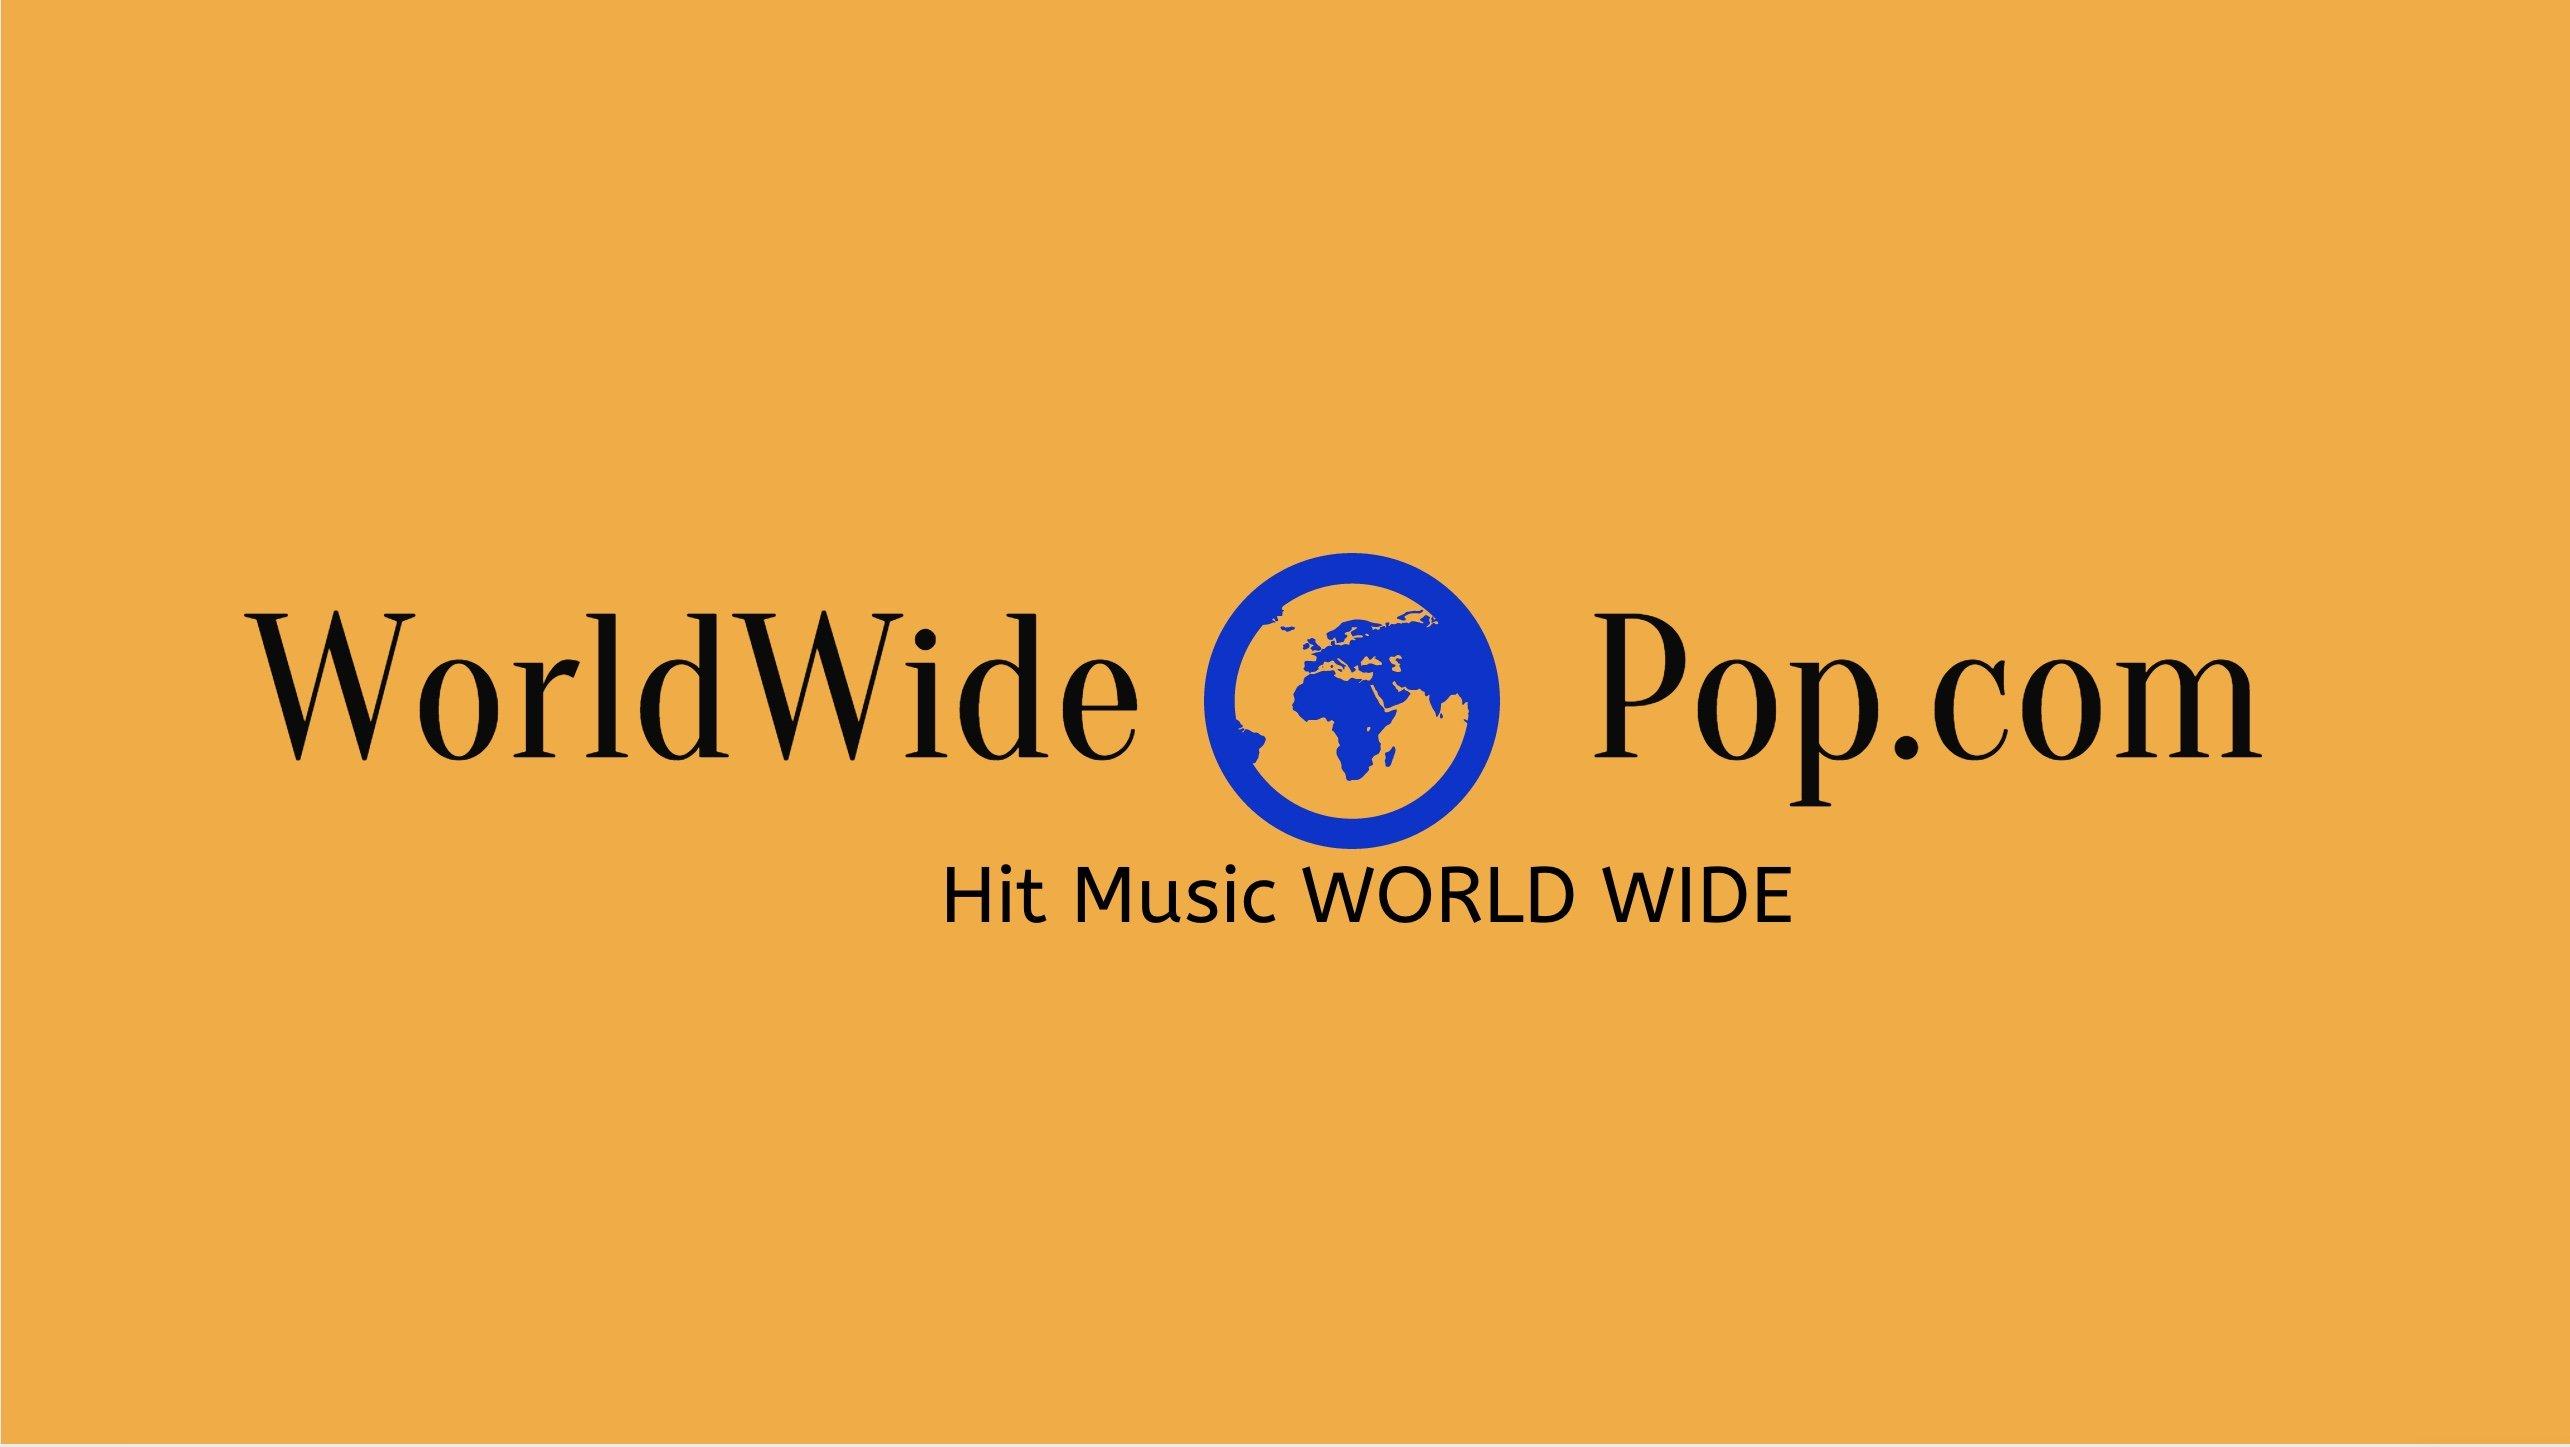 WorldWidePop